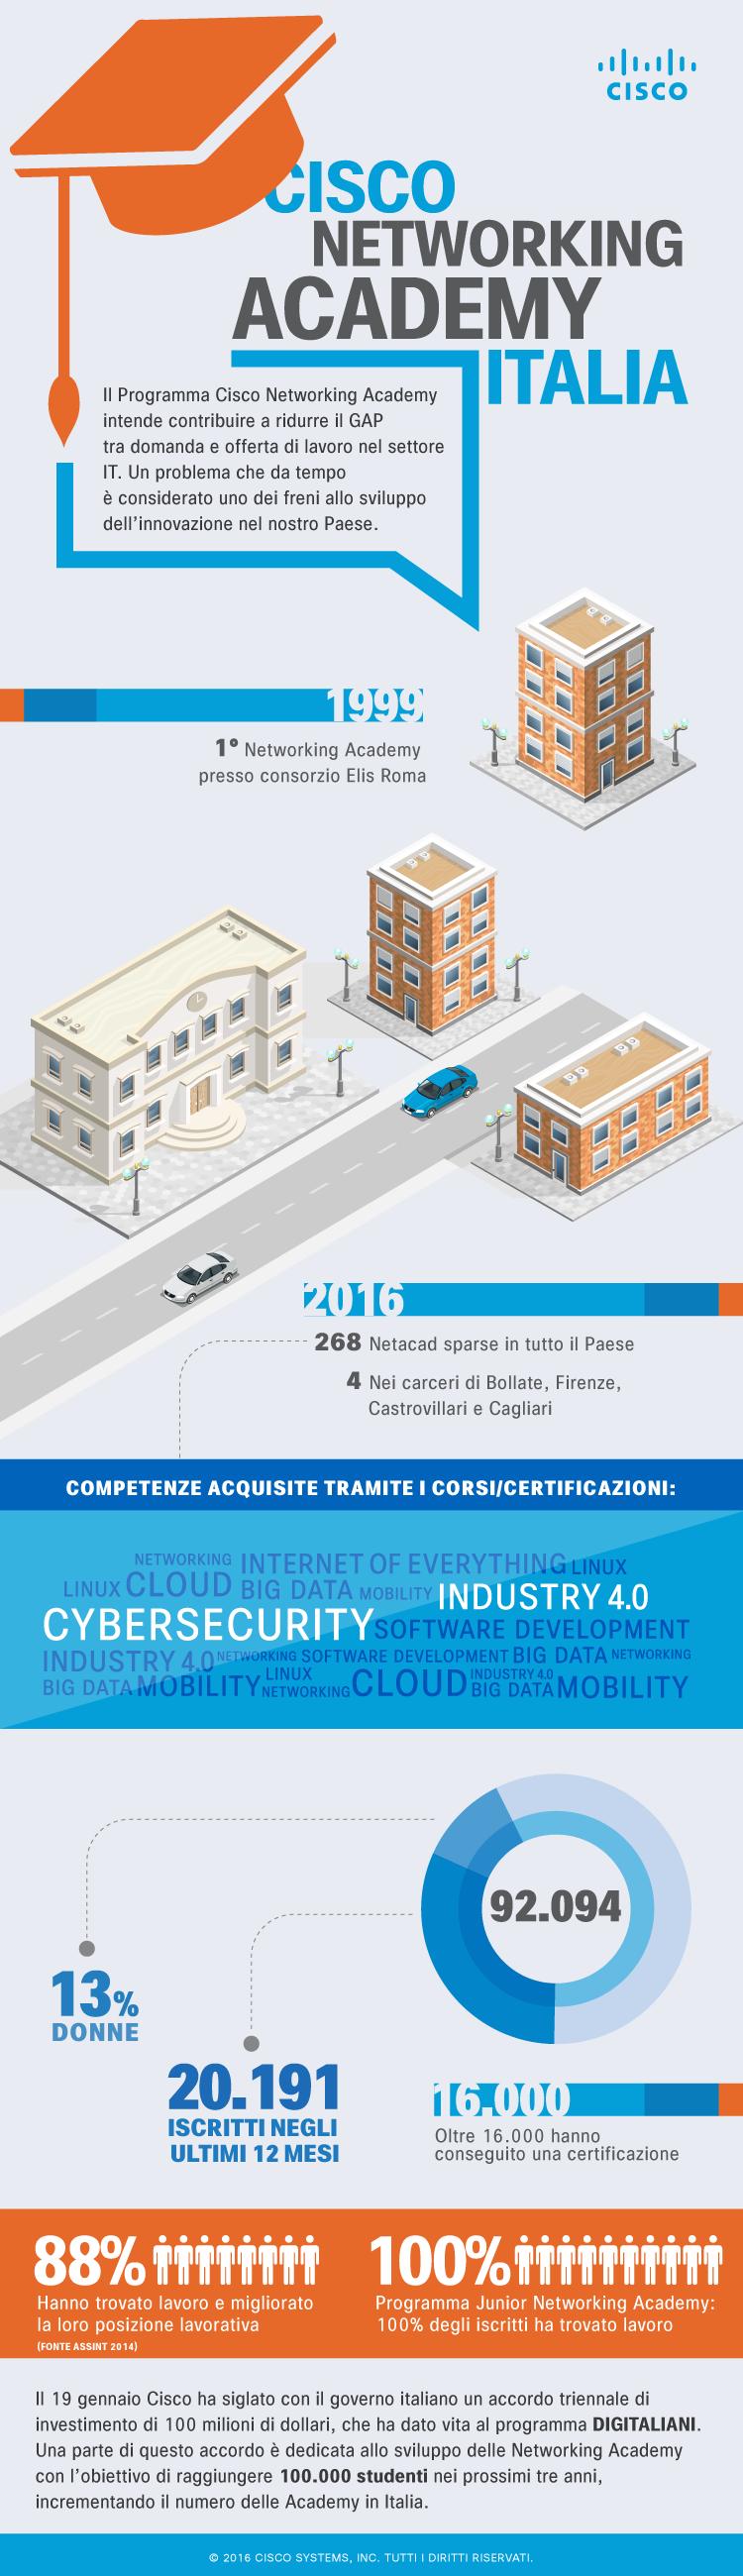 infografica_cisco_netacad